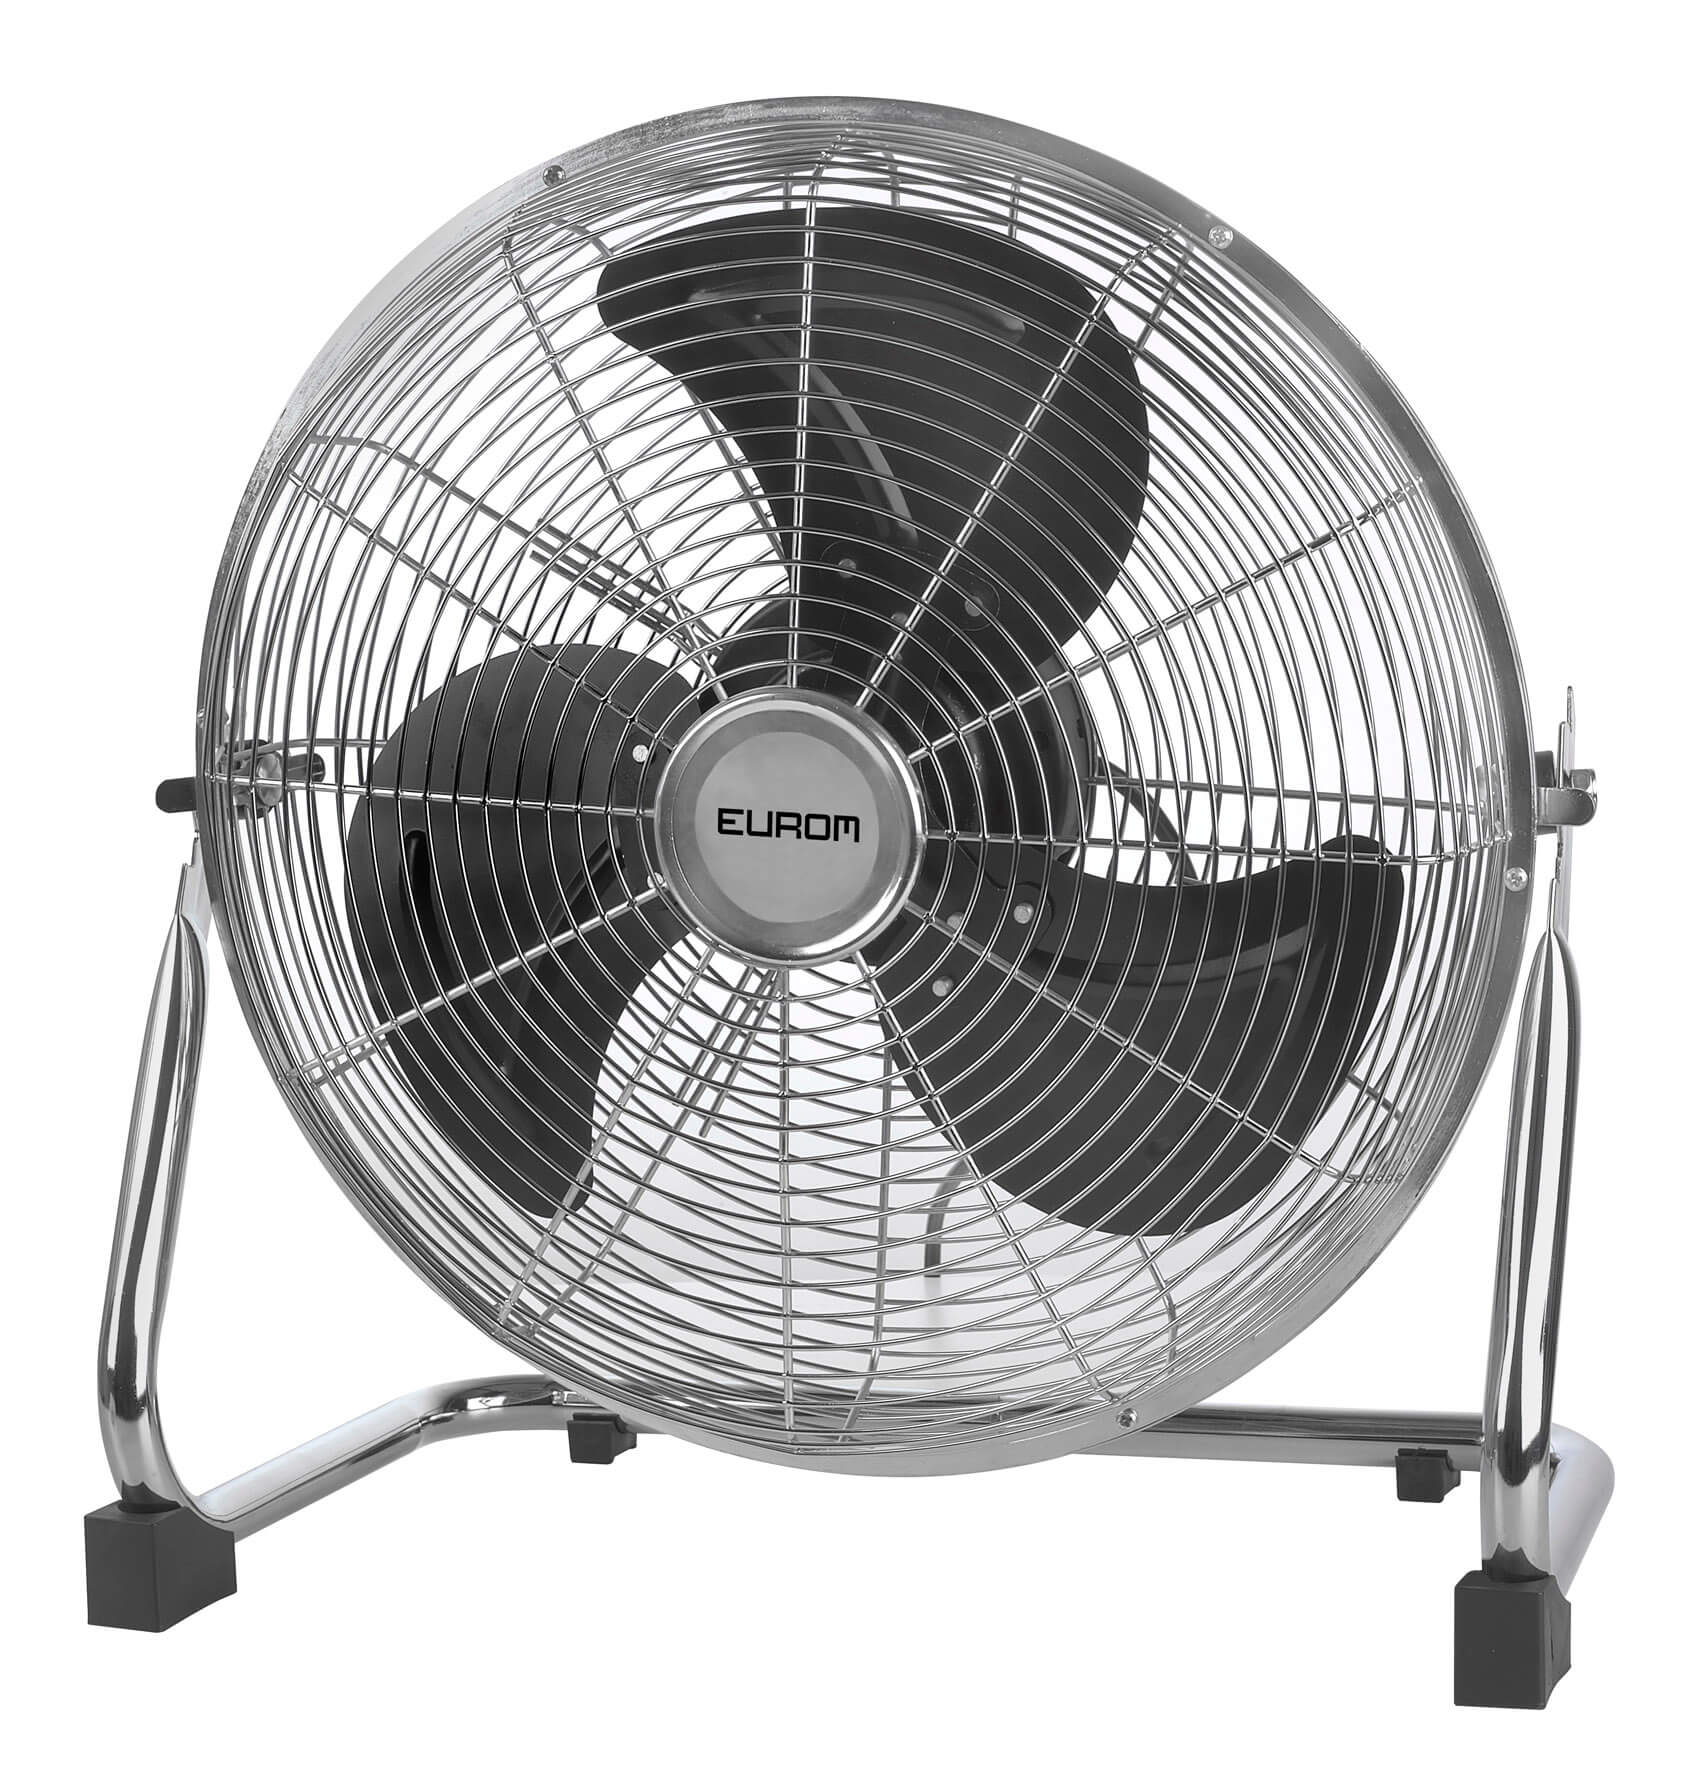 Eurom HVF14-2 Professionele ventilator 35,5 cm | Vloermodel